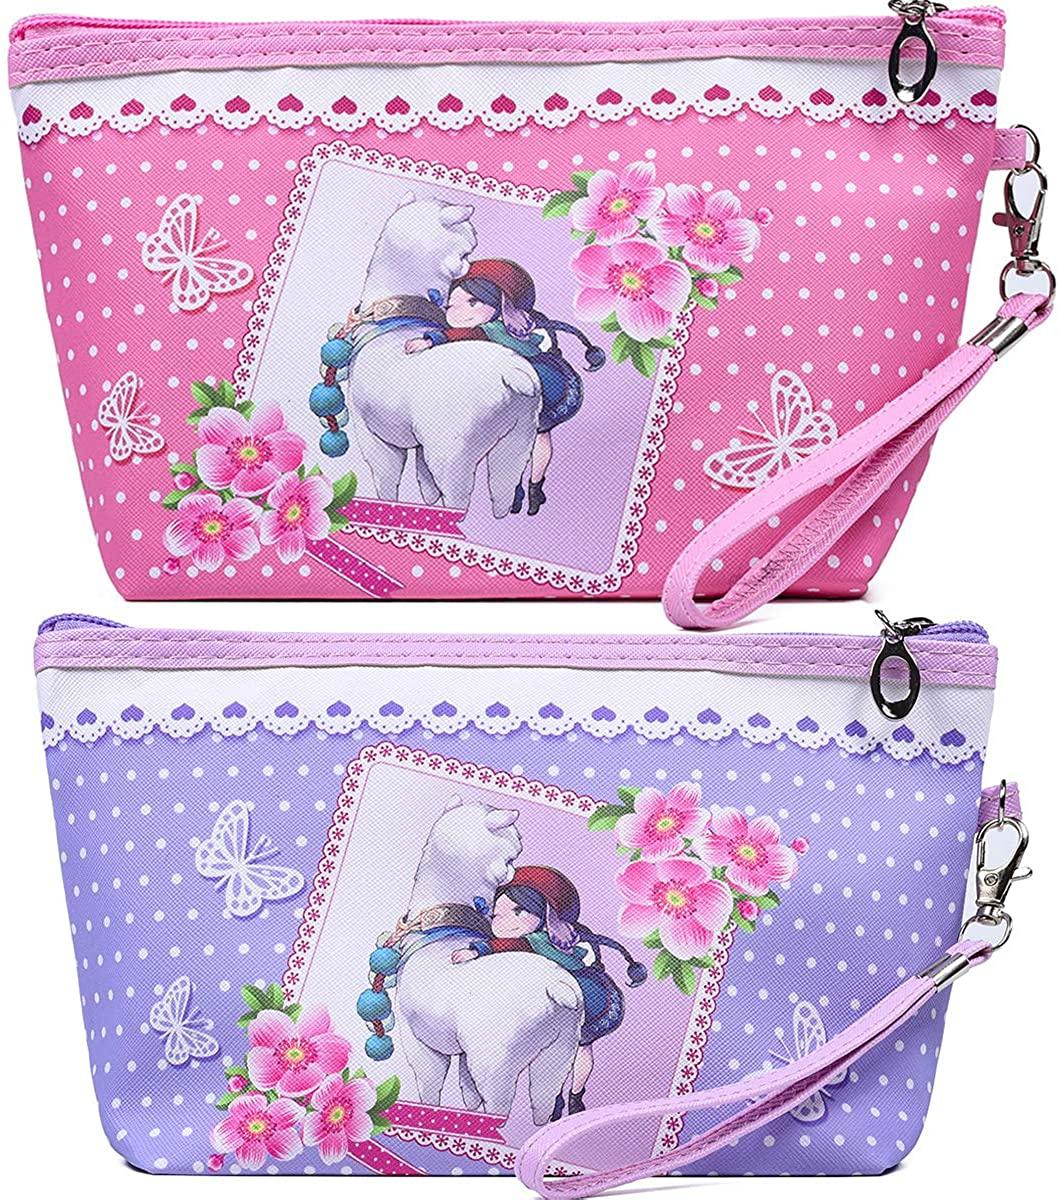 2pcs Travel Makeup Handbag, Waterproof Cosmetic Bags Portable Makeup Organizer Clutch Bag, Cute Portable Cosmetic bag Purse Toiletry Pouch for Women Teen Girls Kids